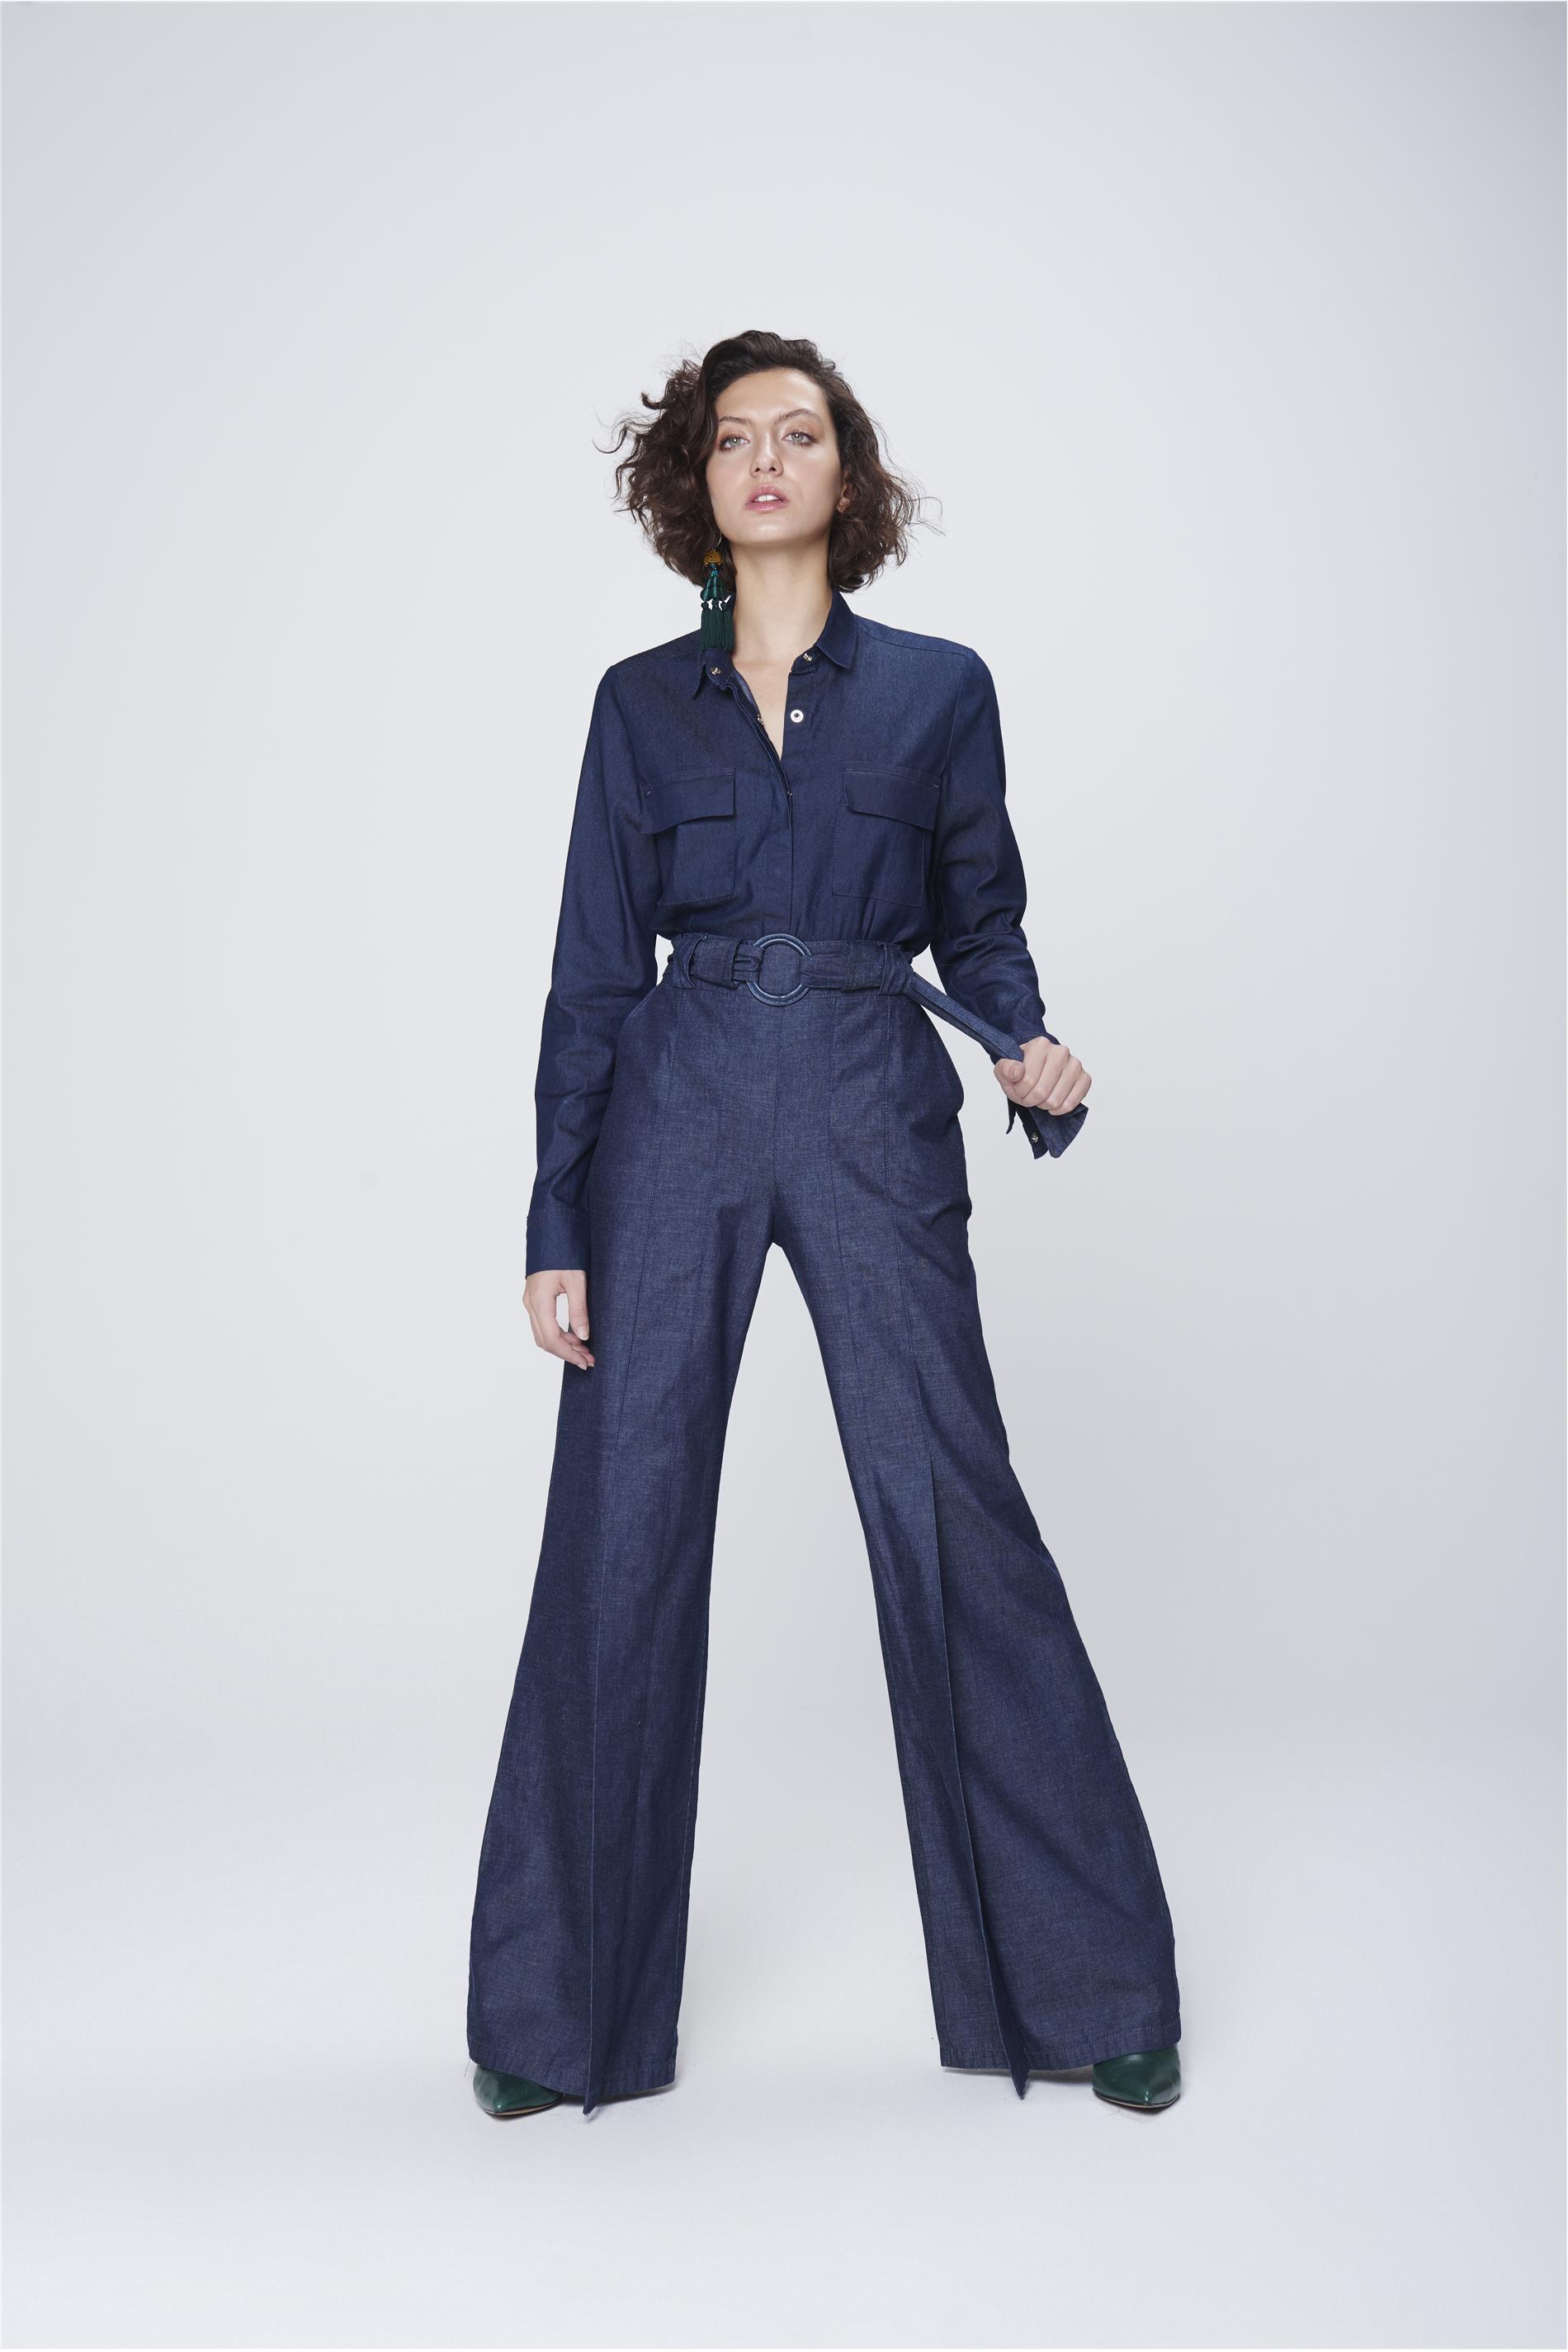 d63df42d96 Calça Pantalona Jeans com Cinto Feminina - Damyller